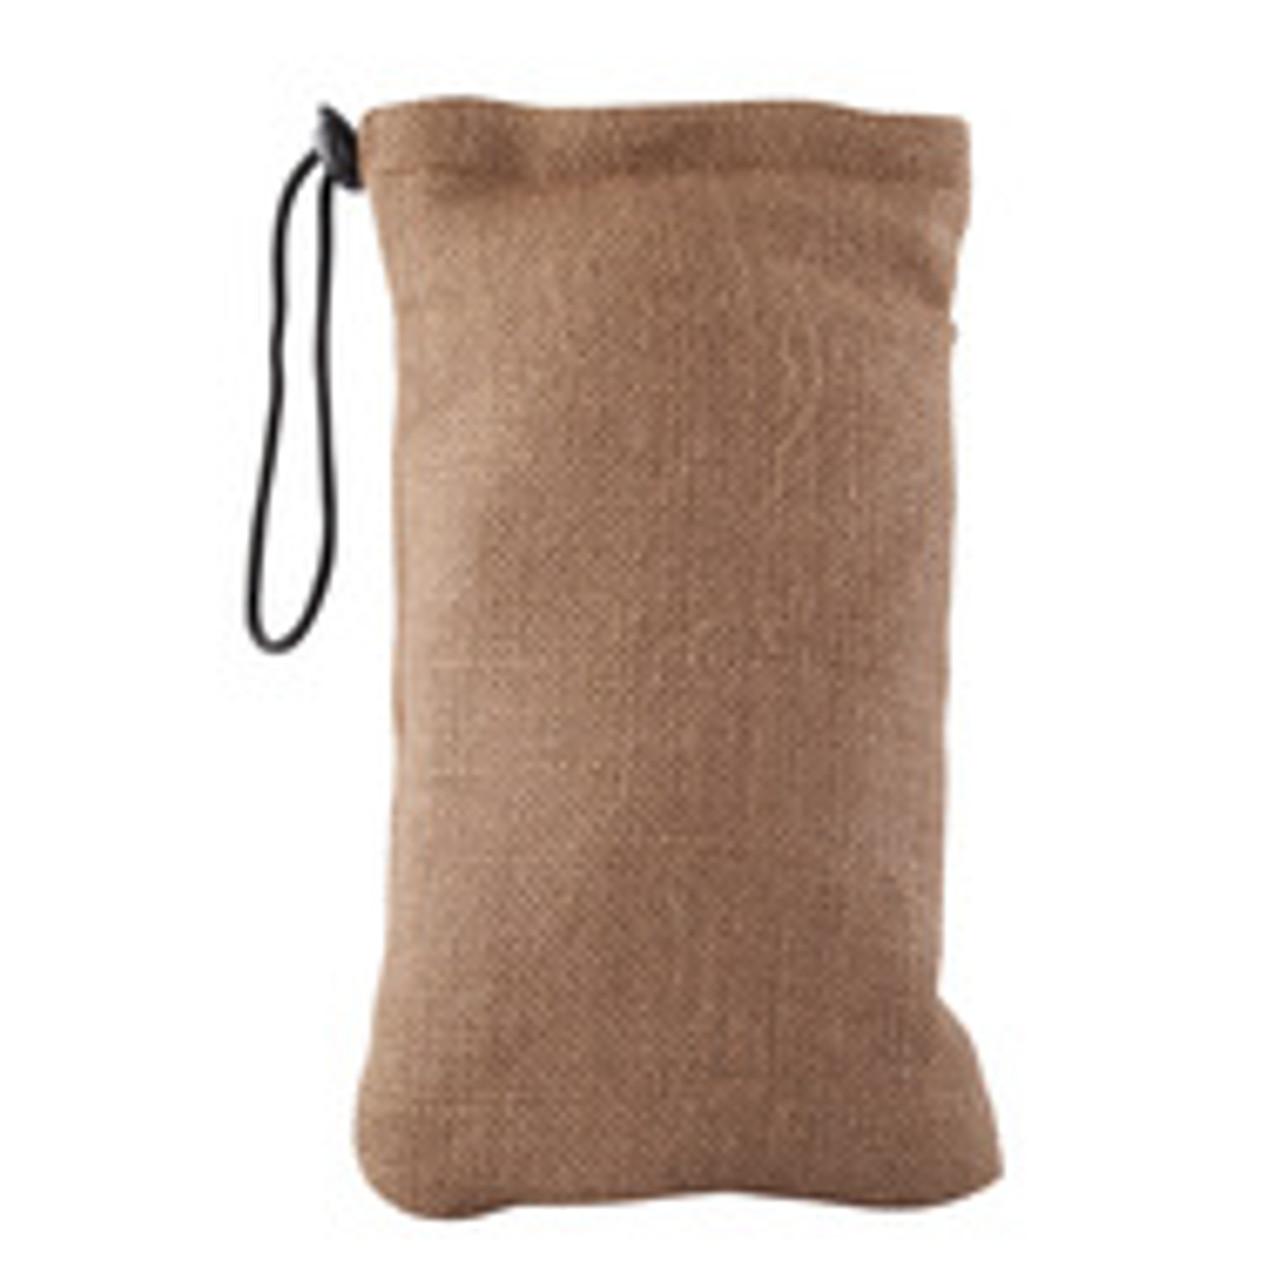 Bug Rugz Drawstring Bags (SM, MED, LG) glass pipe protection bag UNS Wholesale Smoke Shop Distributor Head Shop Novelty Supplies Wholesale